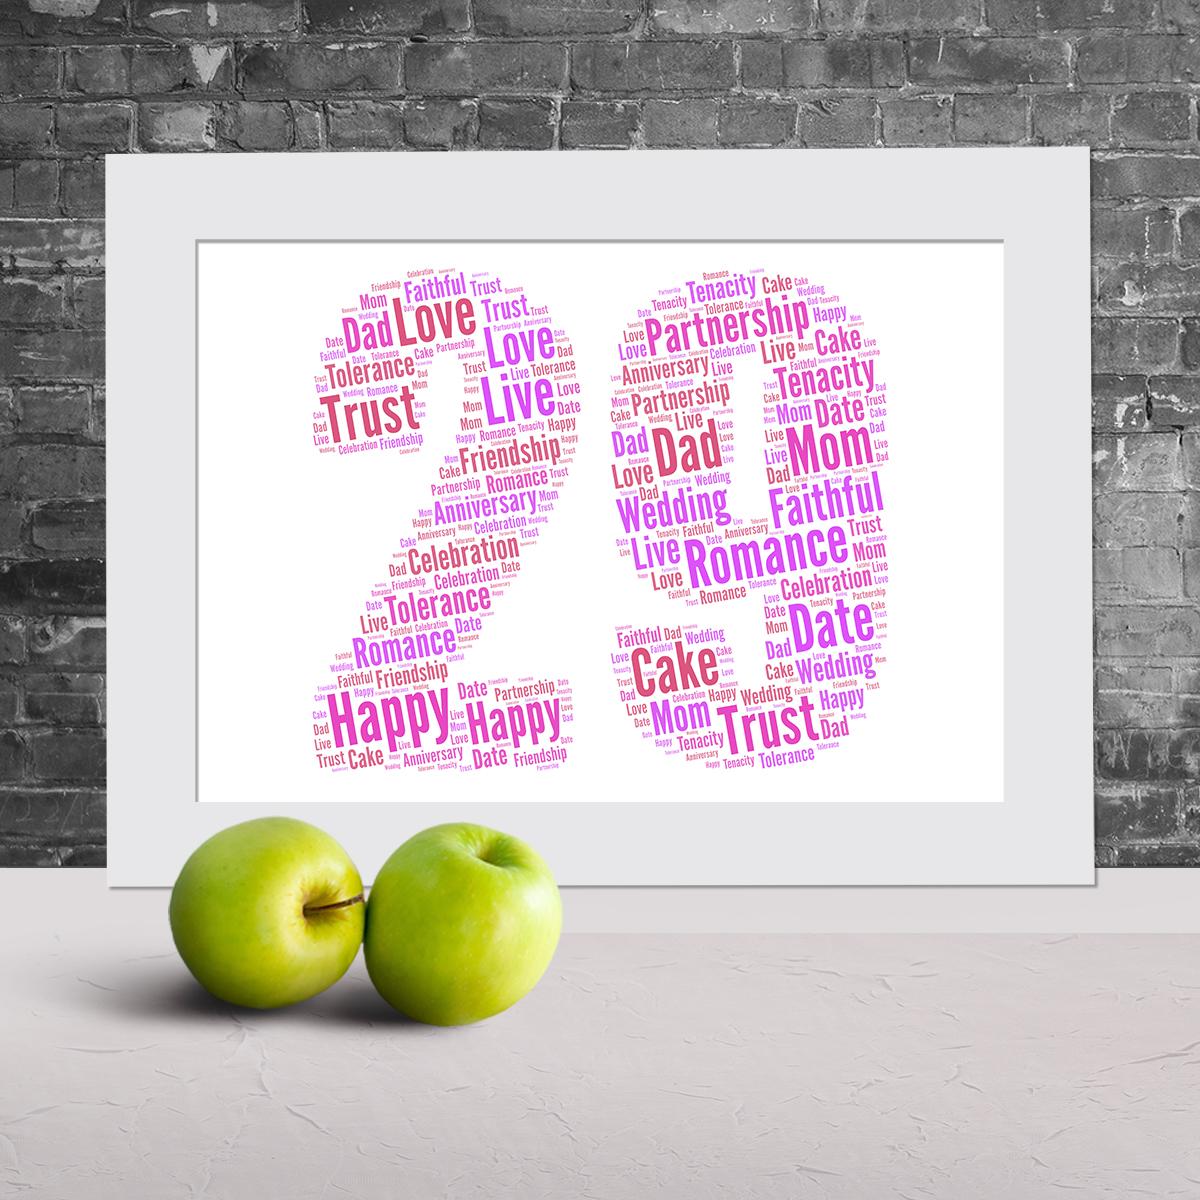 29th anniversary word art | word art prints - word art app